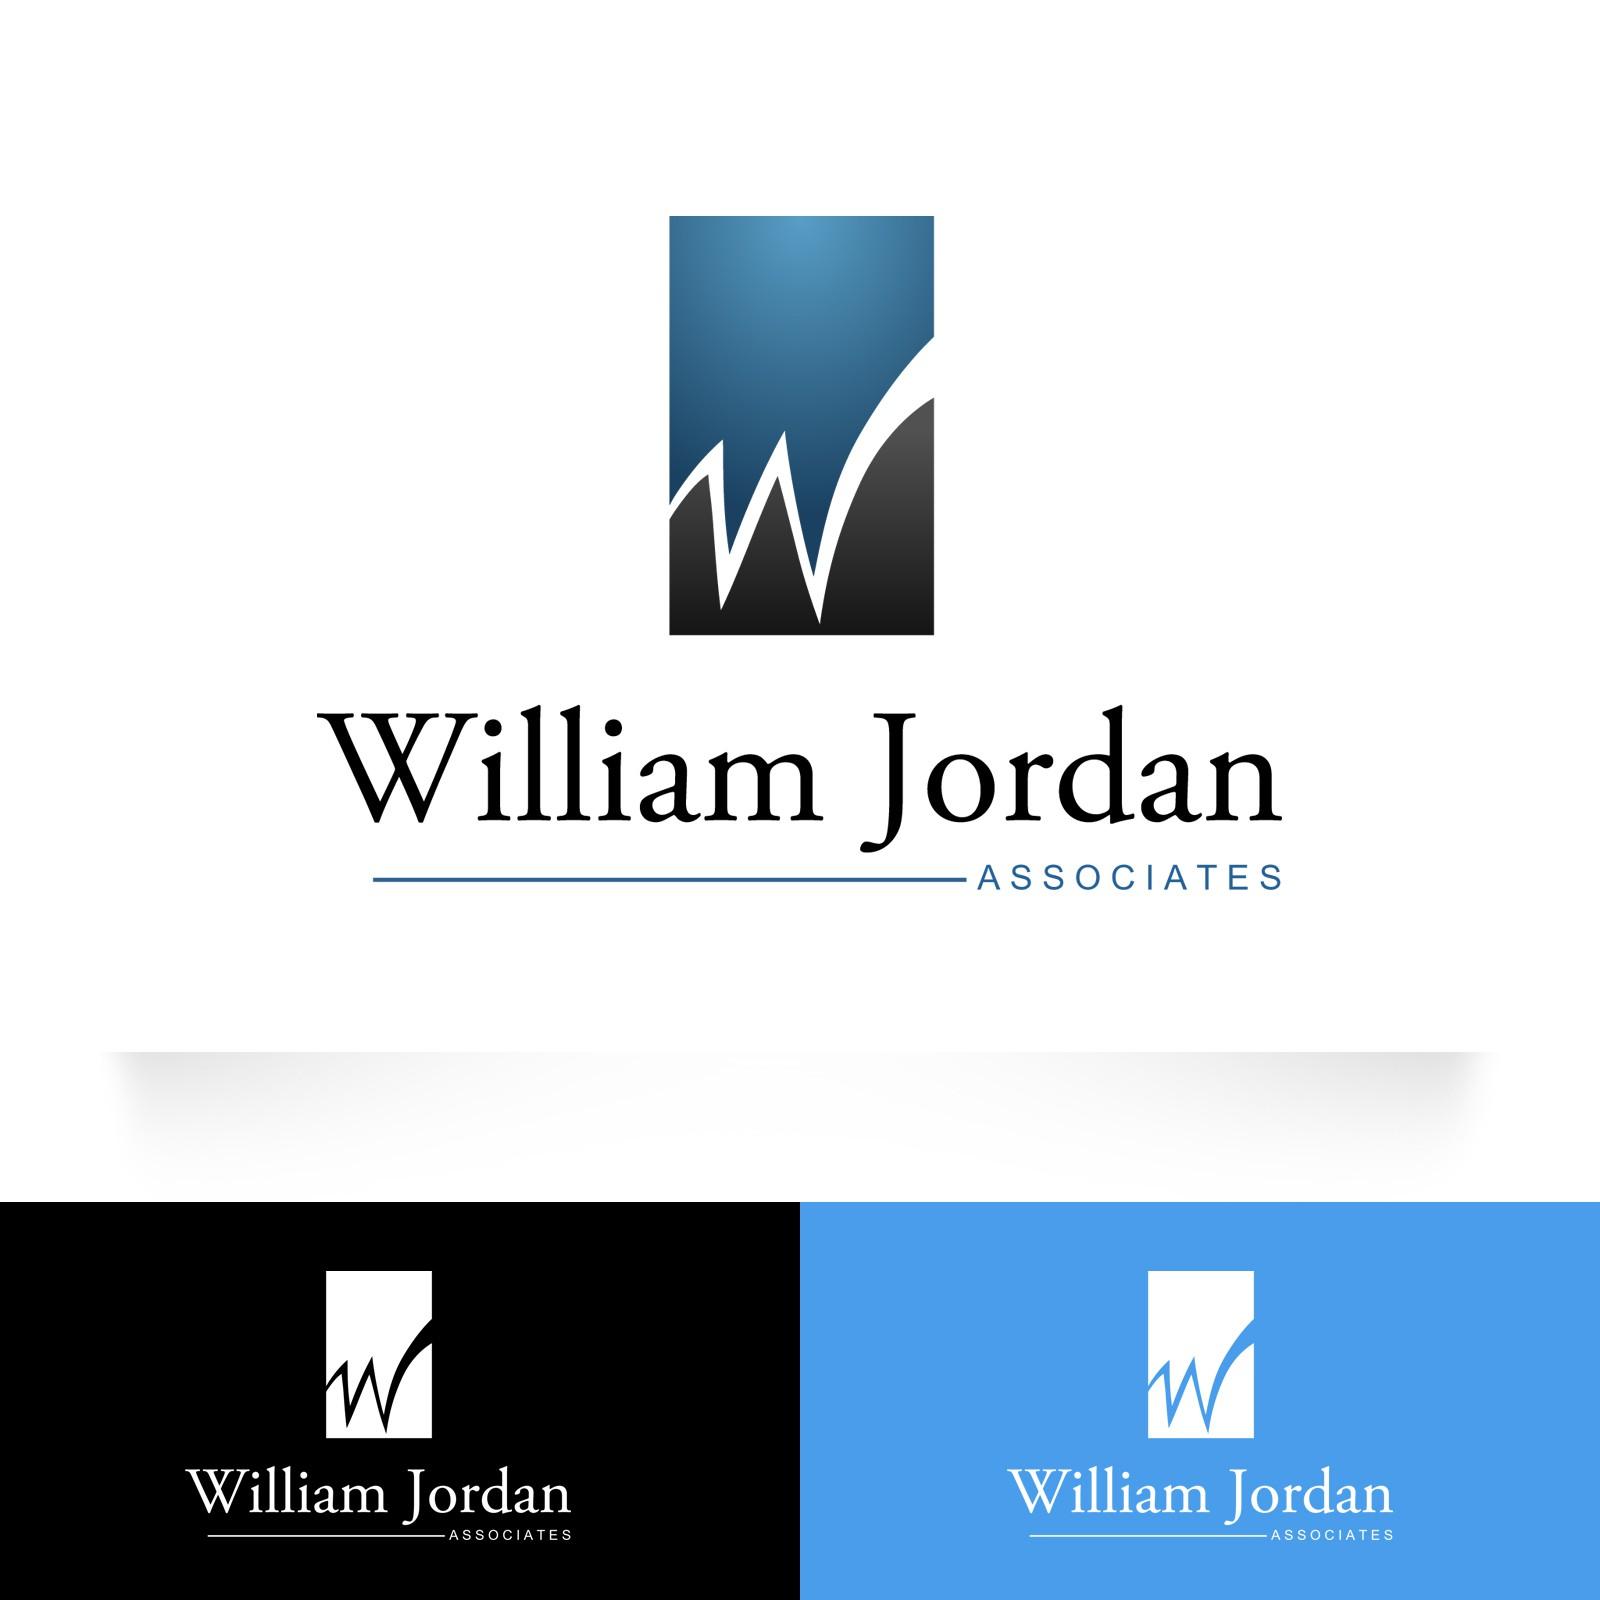 New logo wanted for William Jordan Associates